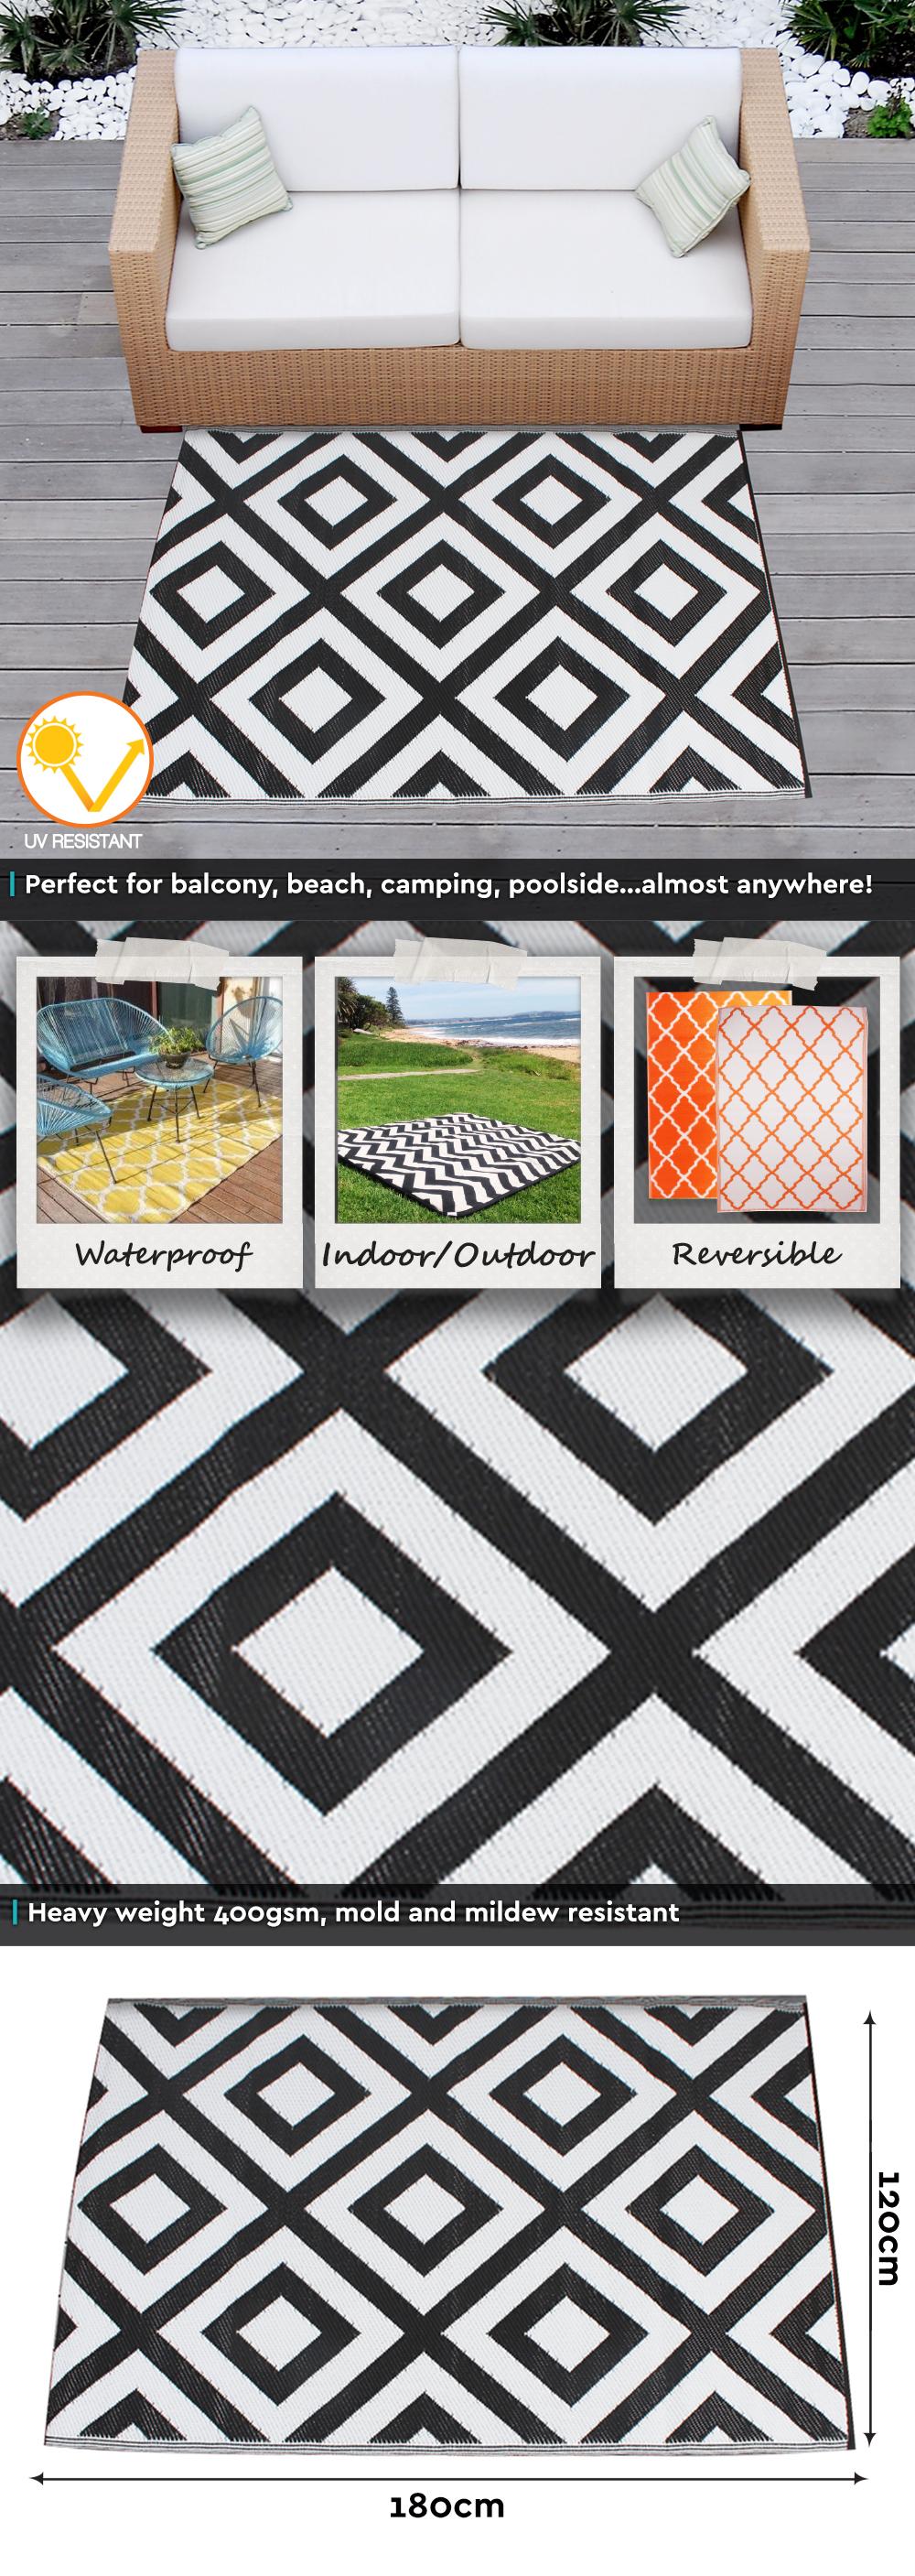 outdoor plastic rug mat recycled polypropylene patio picnic 180x120cm black geo ebay. Black Bedroom Furniture Sets. Home Design Ideas